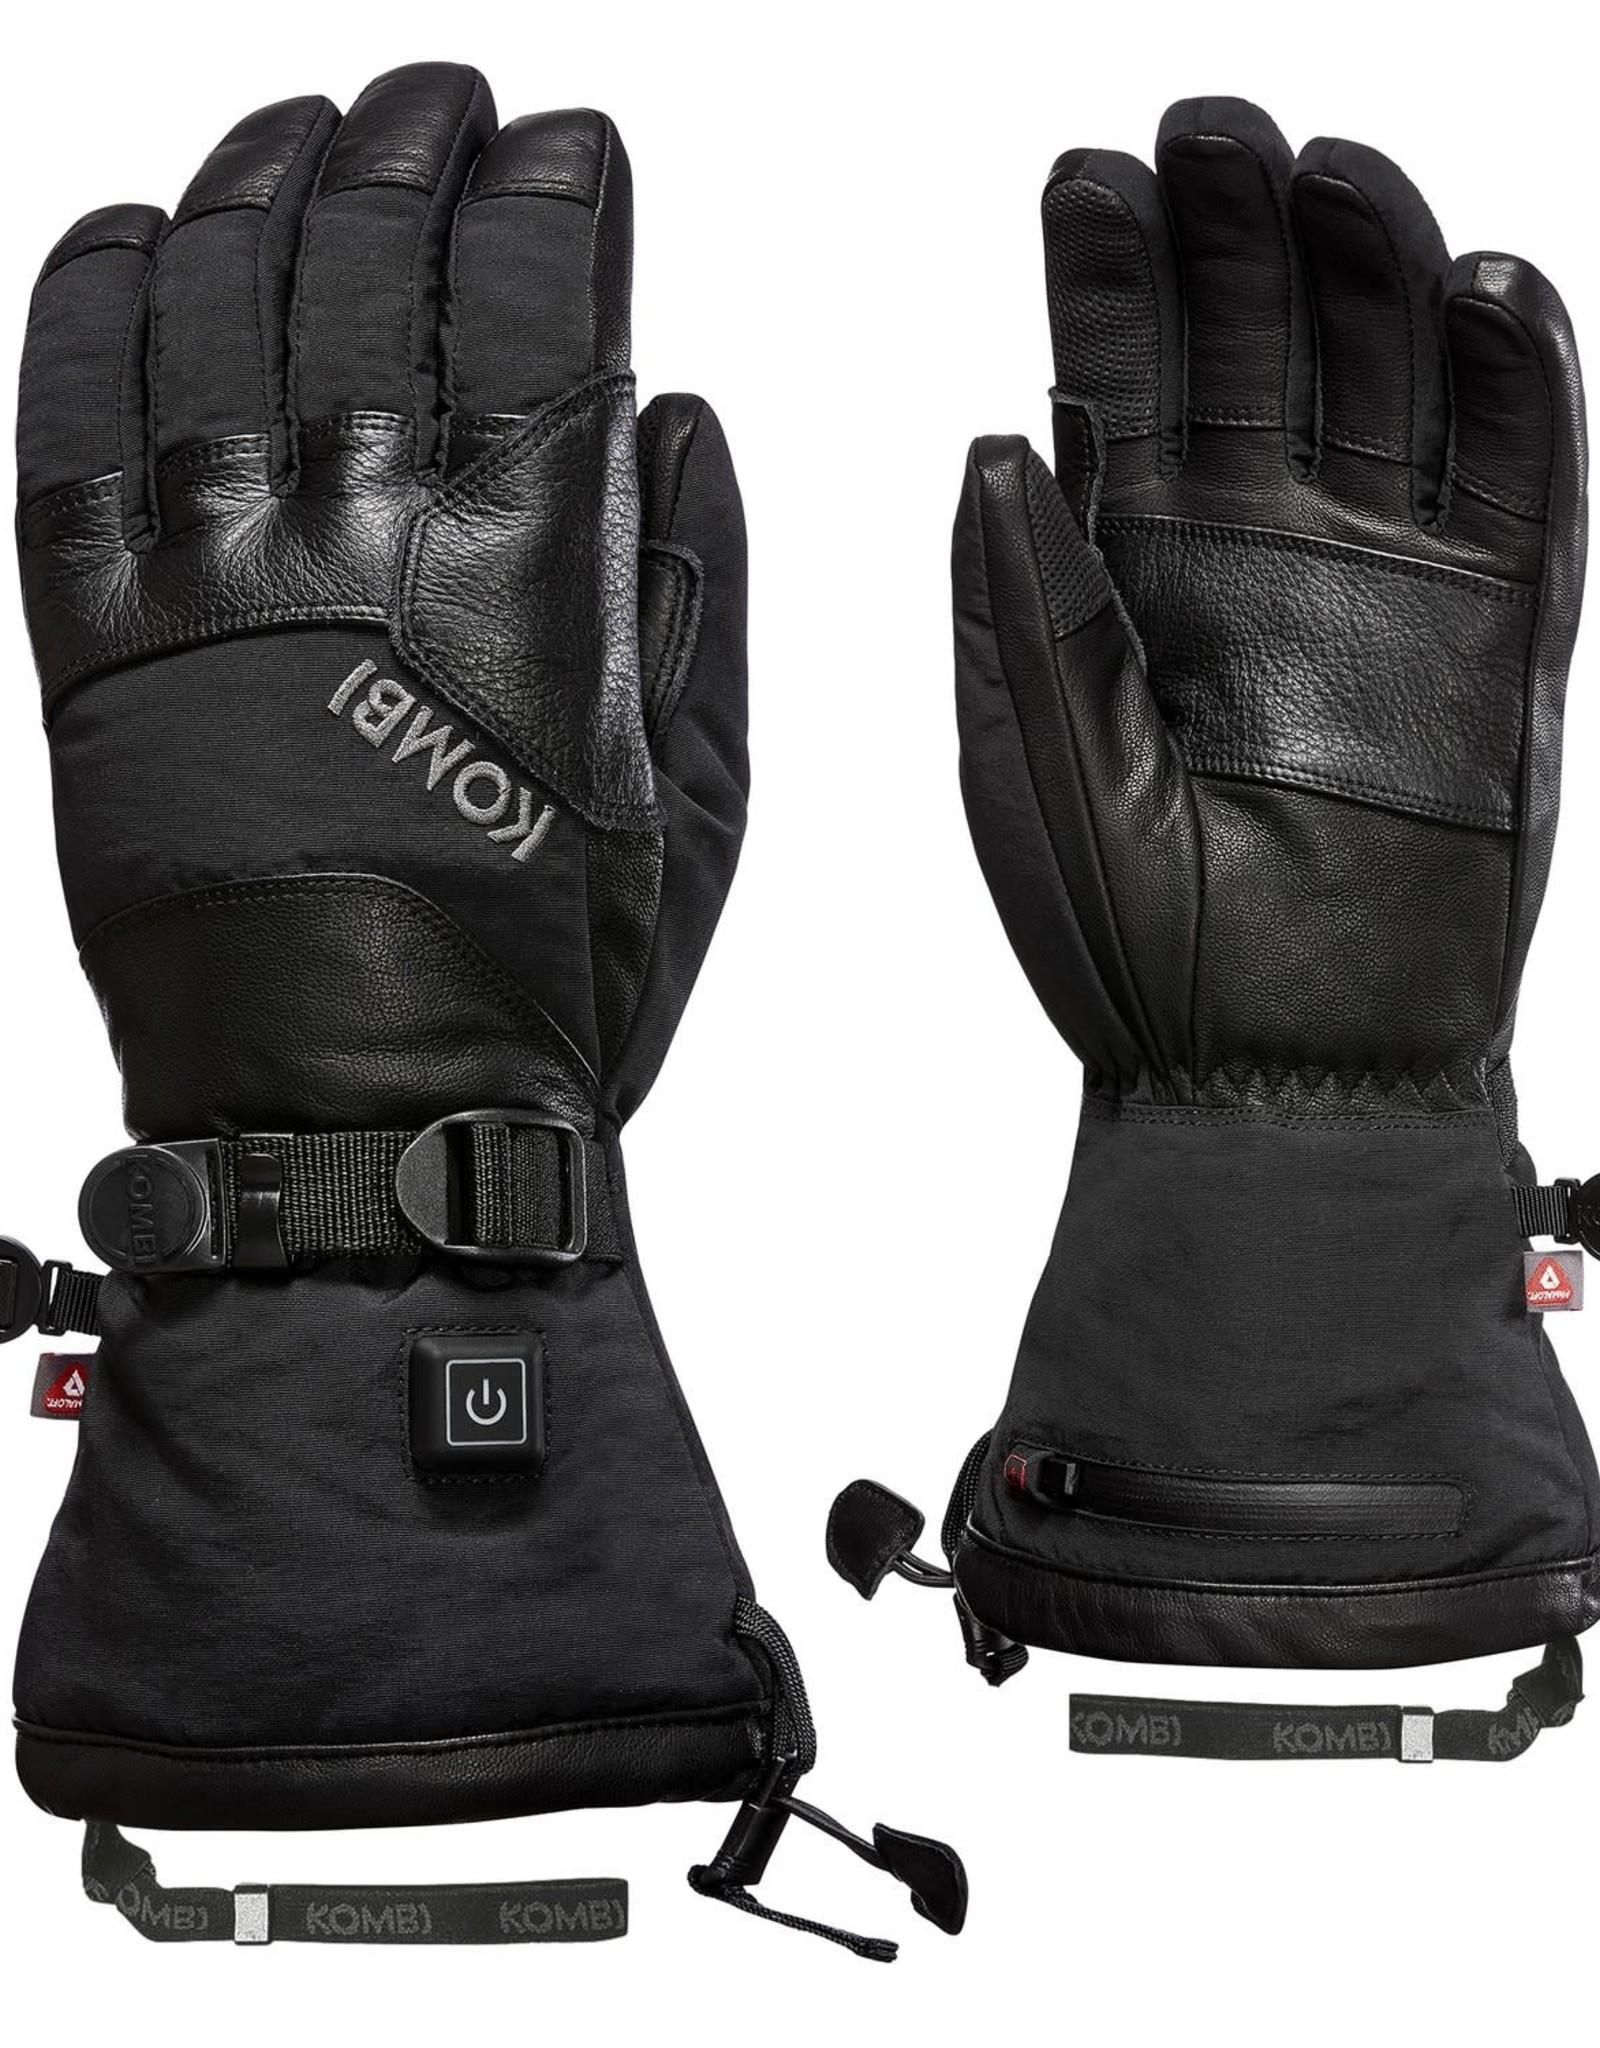 Kombi Kombi - WARM UP POWER Glove - Black -